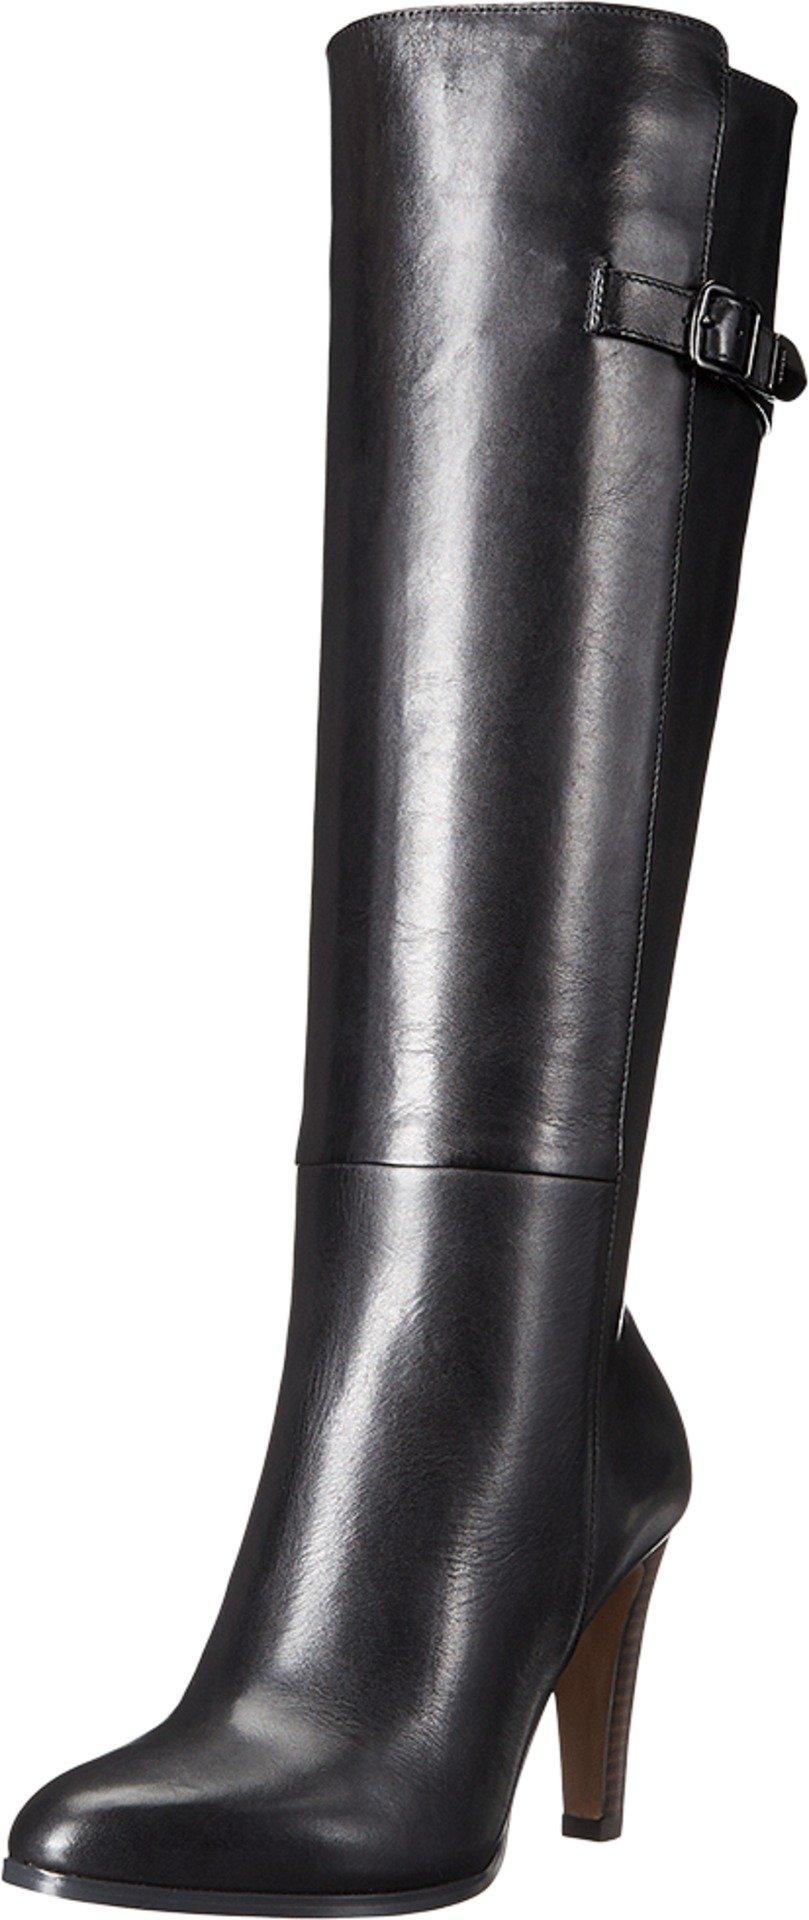 Coach Womens Flat Sandals, Black, Size 5.5